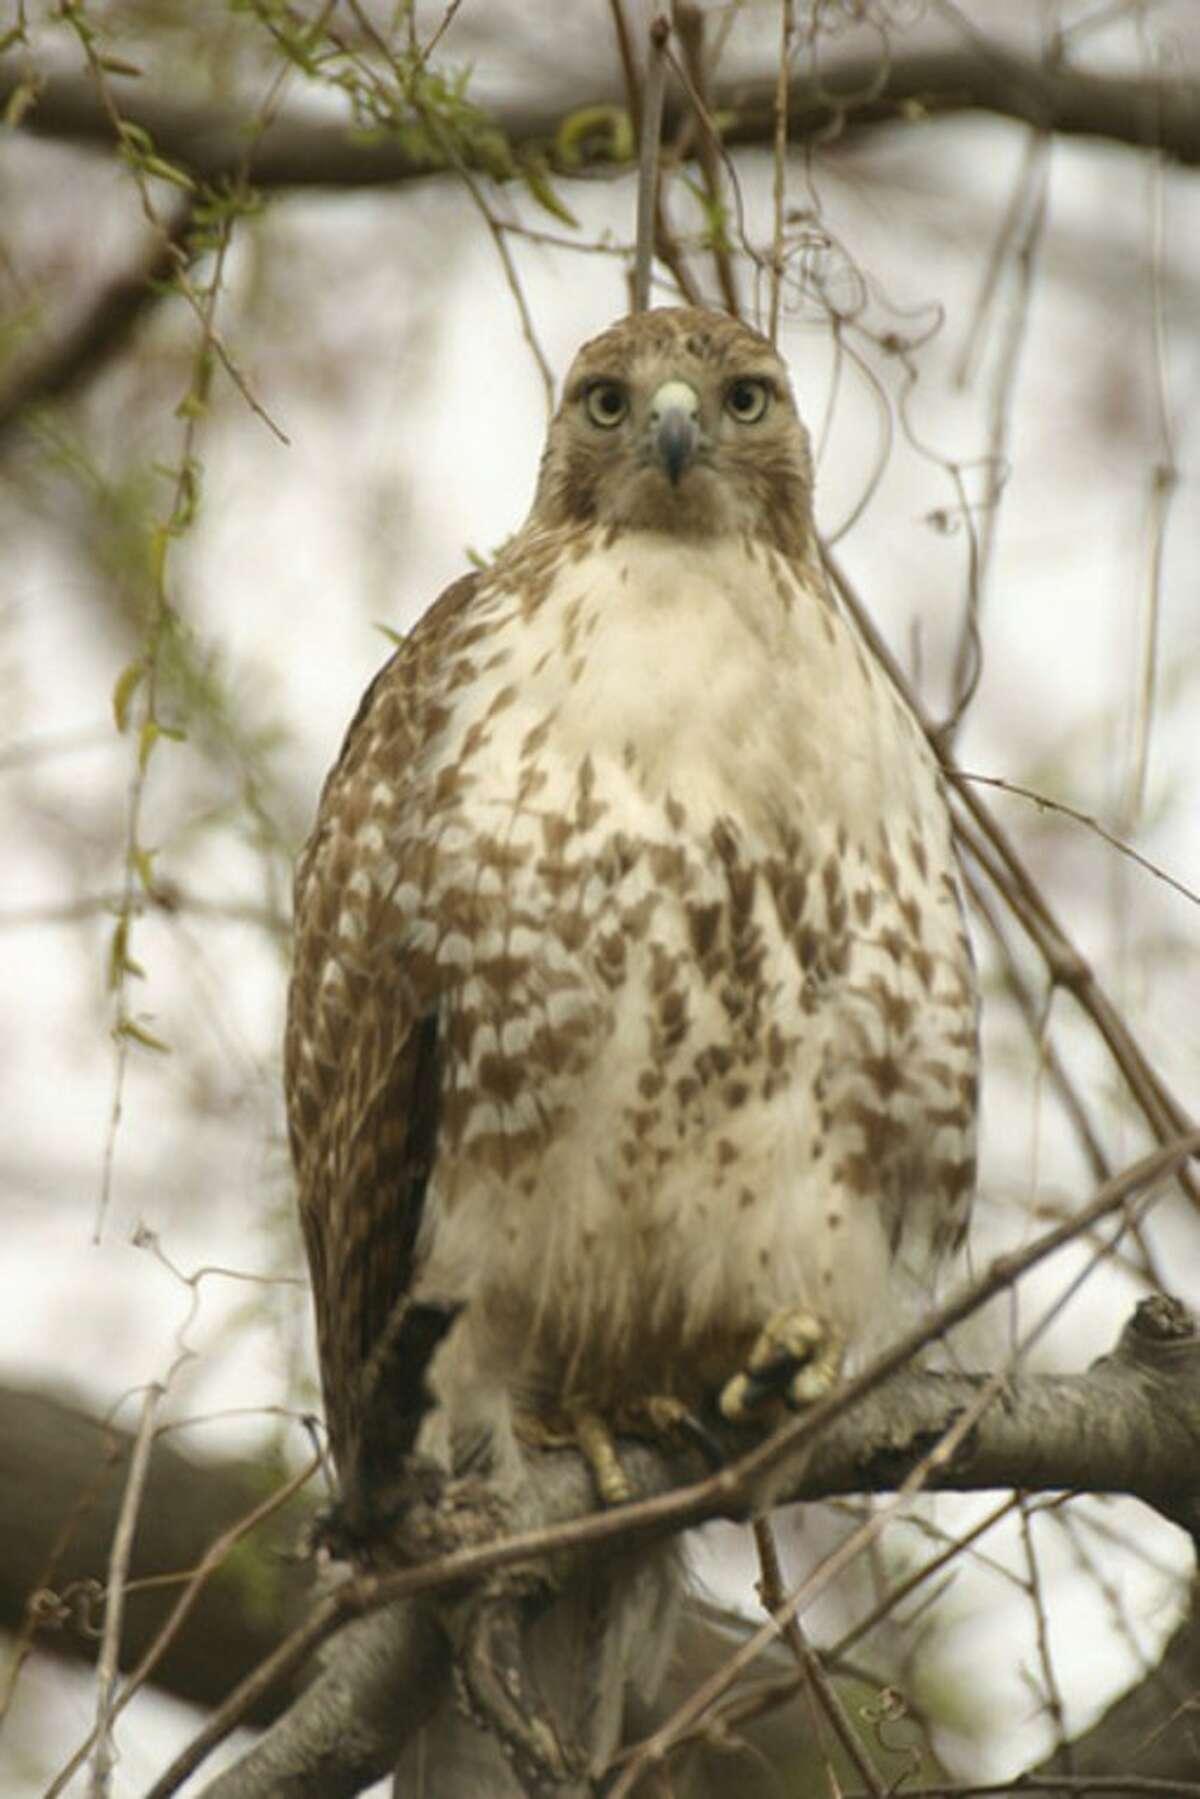 Photo by Chris Bosak Red-tailed hawk in Norwalk.